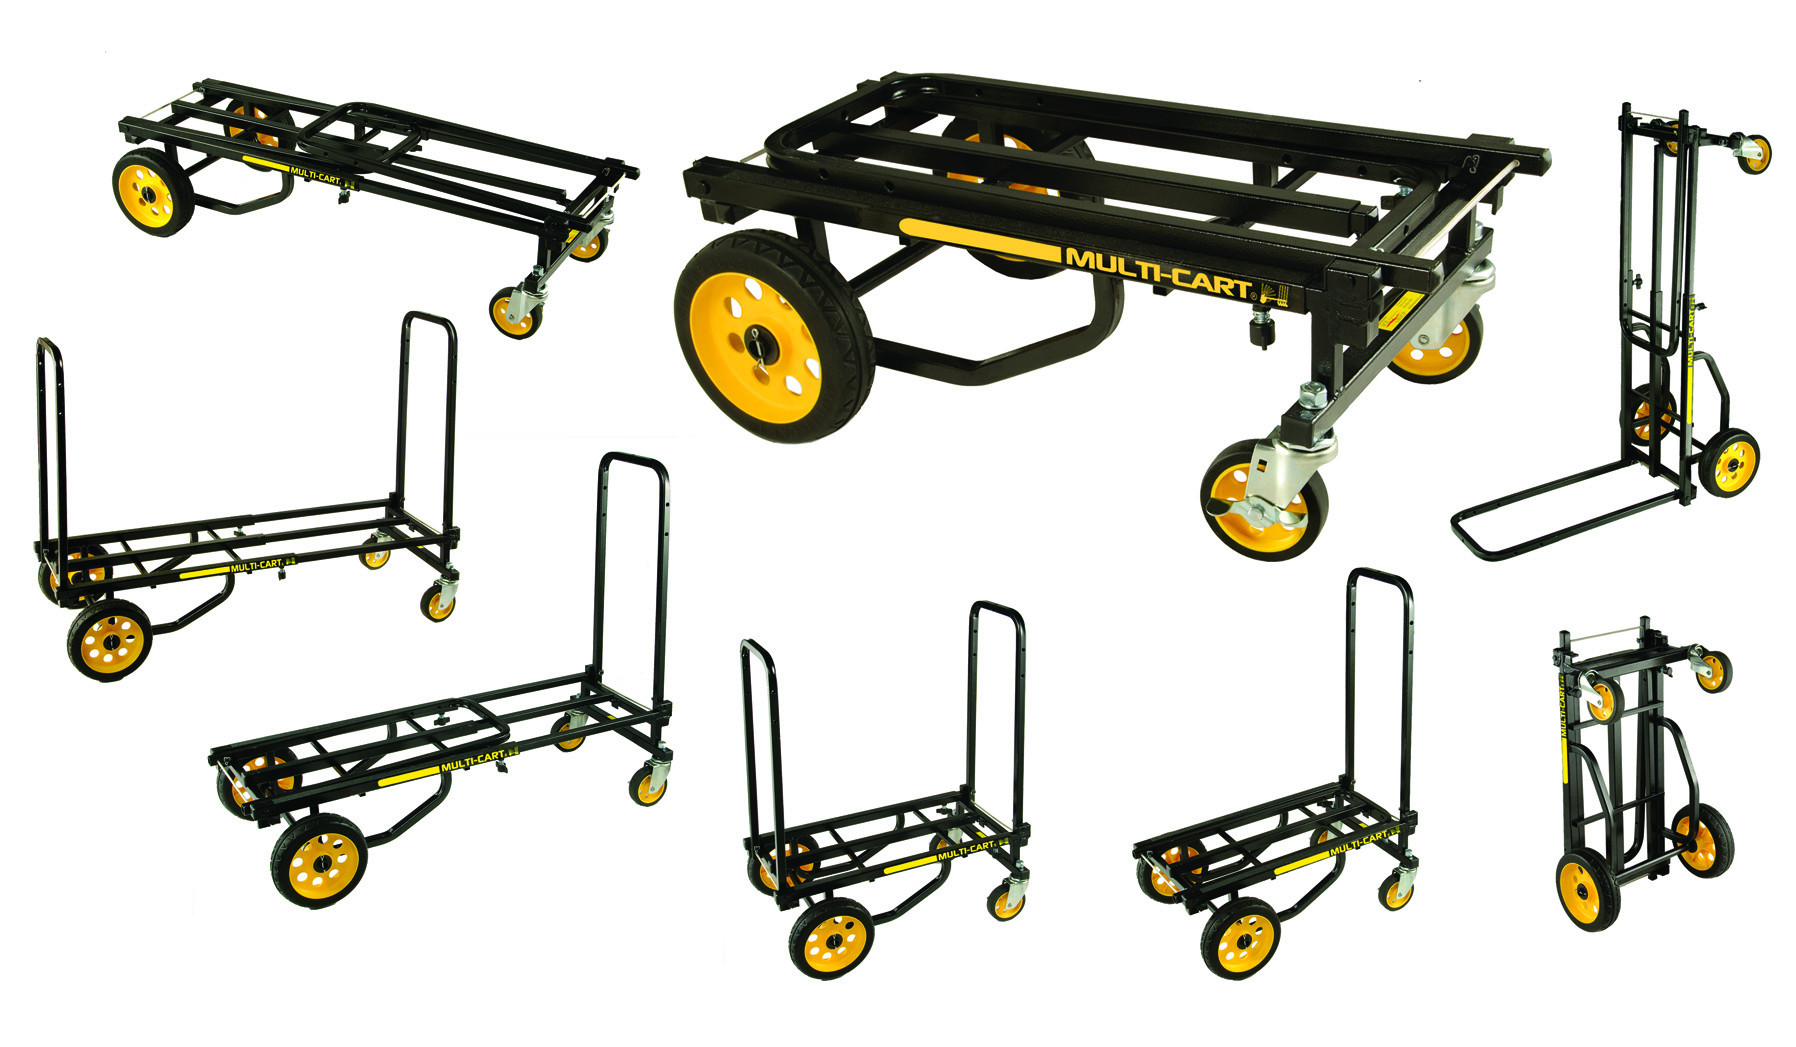 multi-cart_r6rt_8-1